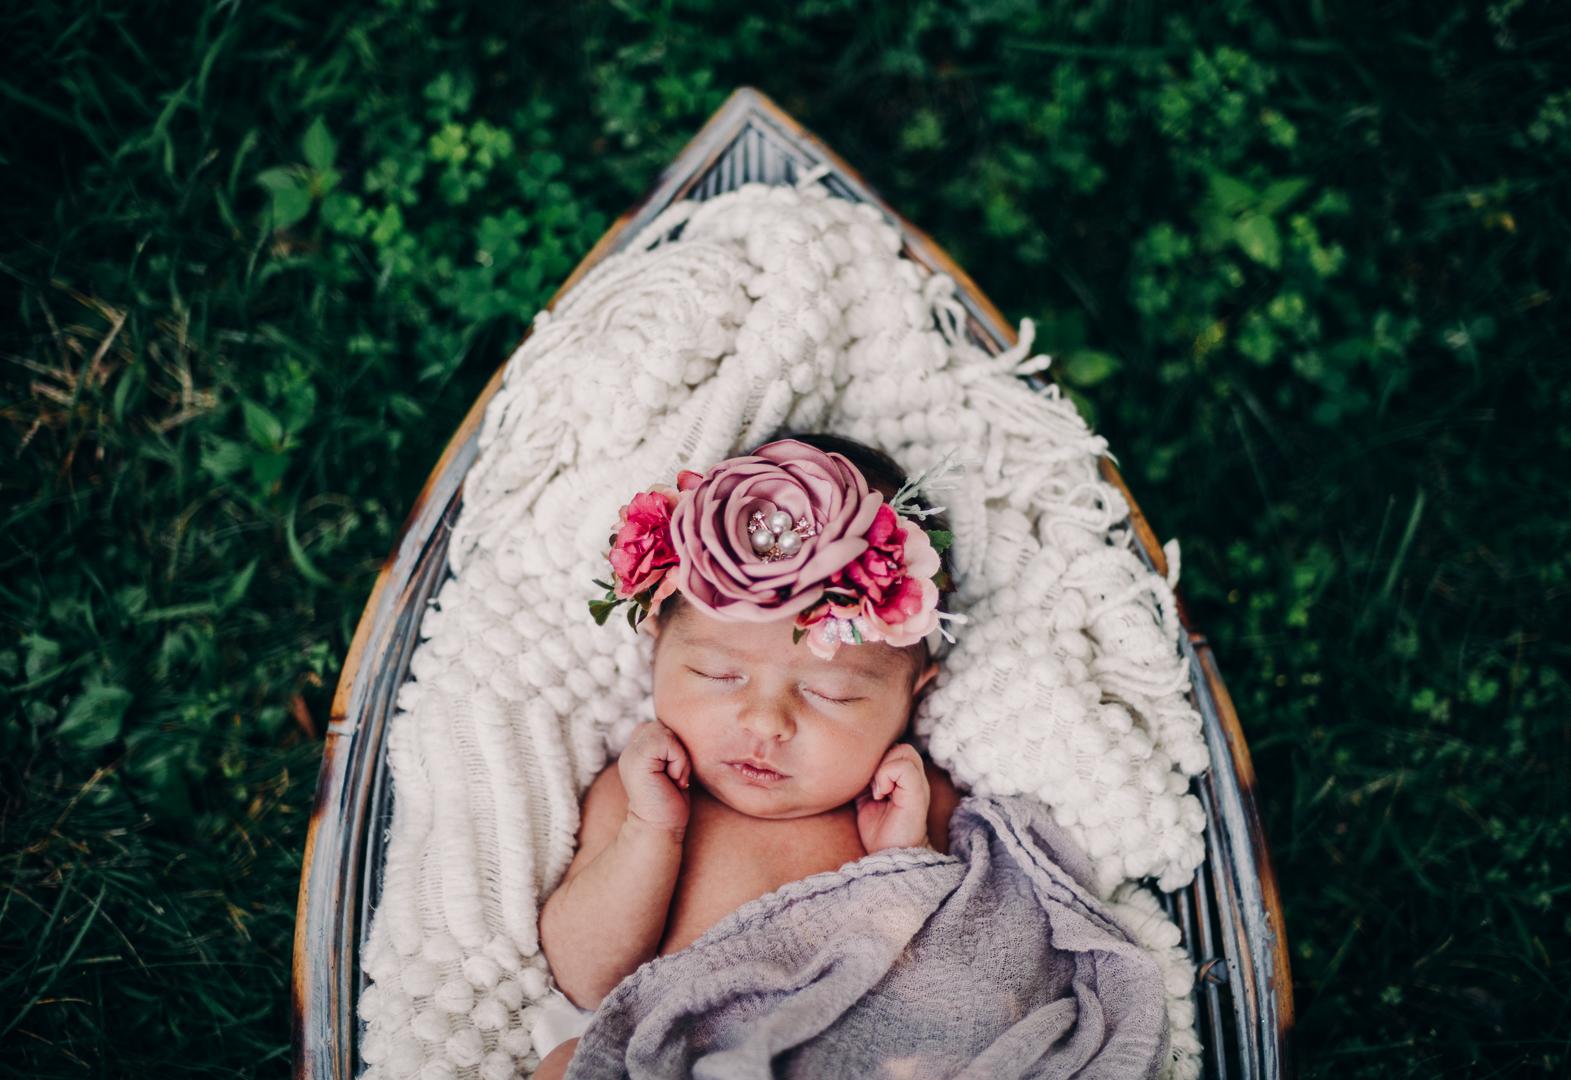 TerraSuraPhotography-Sloane Vasseur Family Newborn-Web-5347.jpg